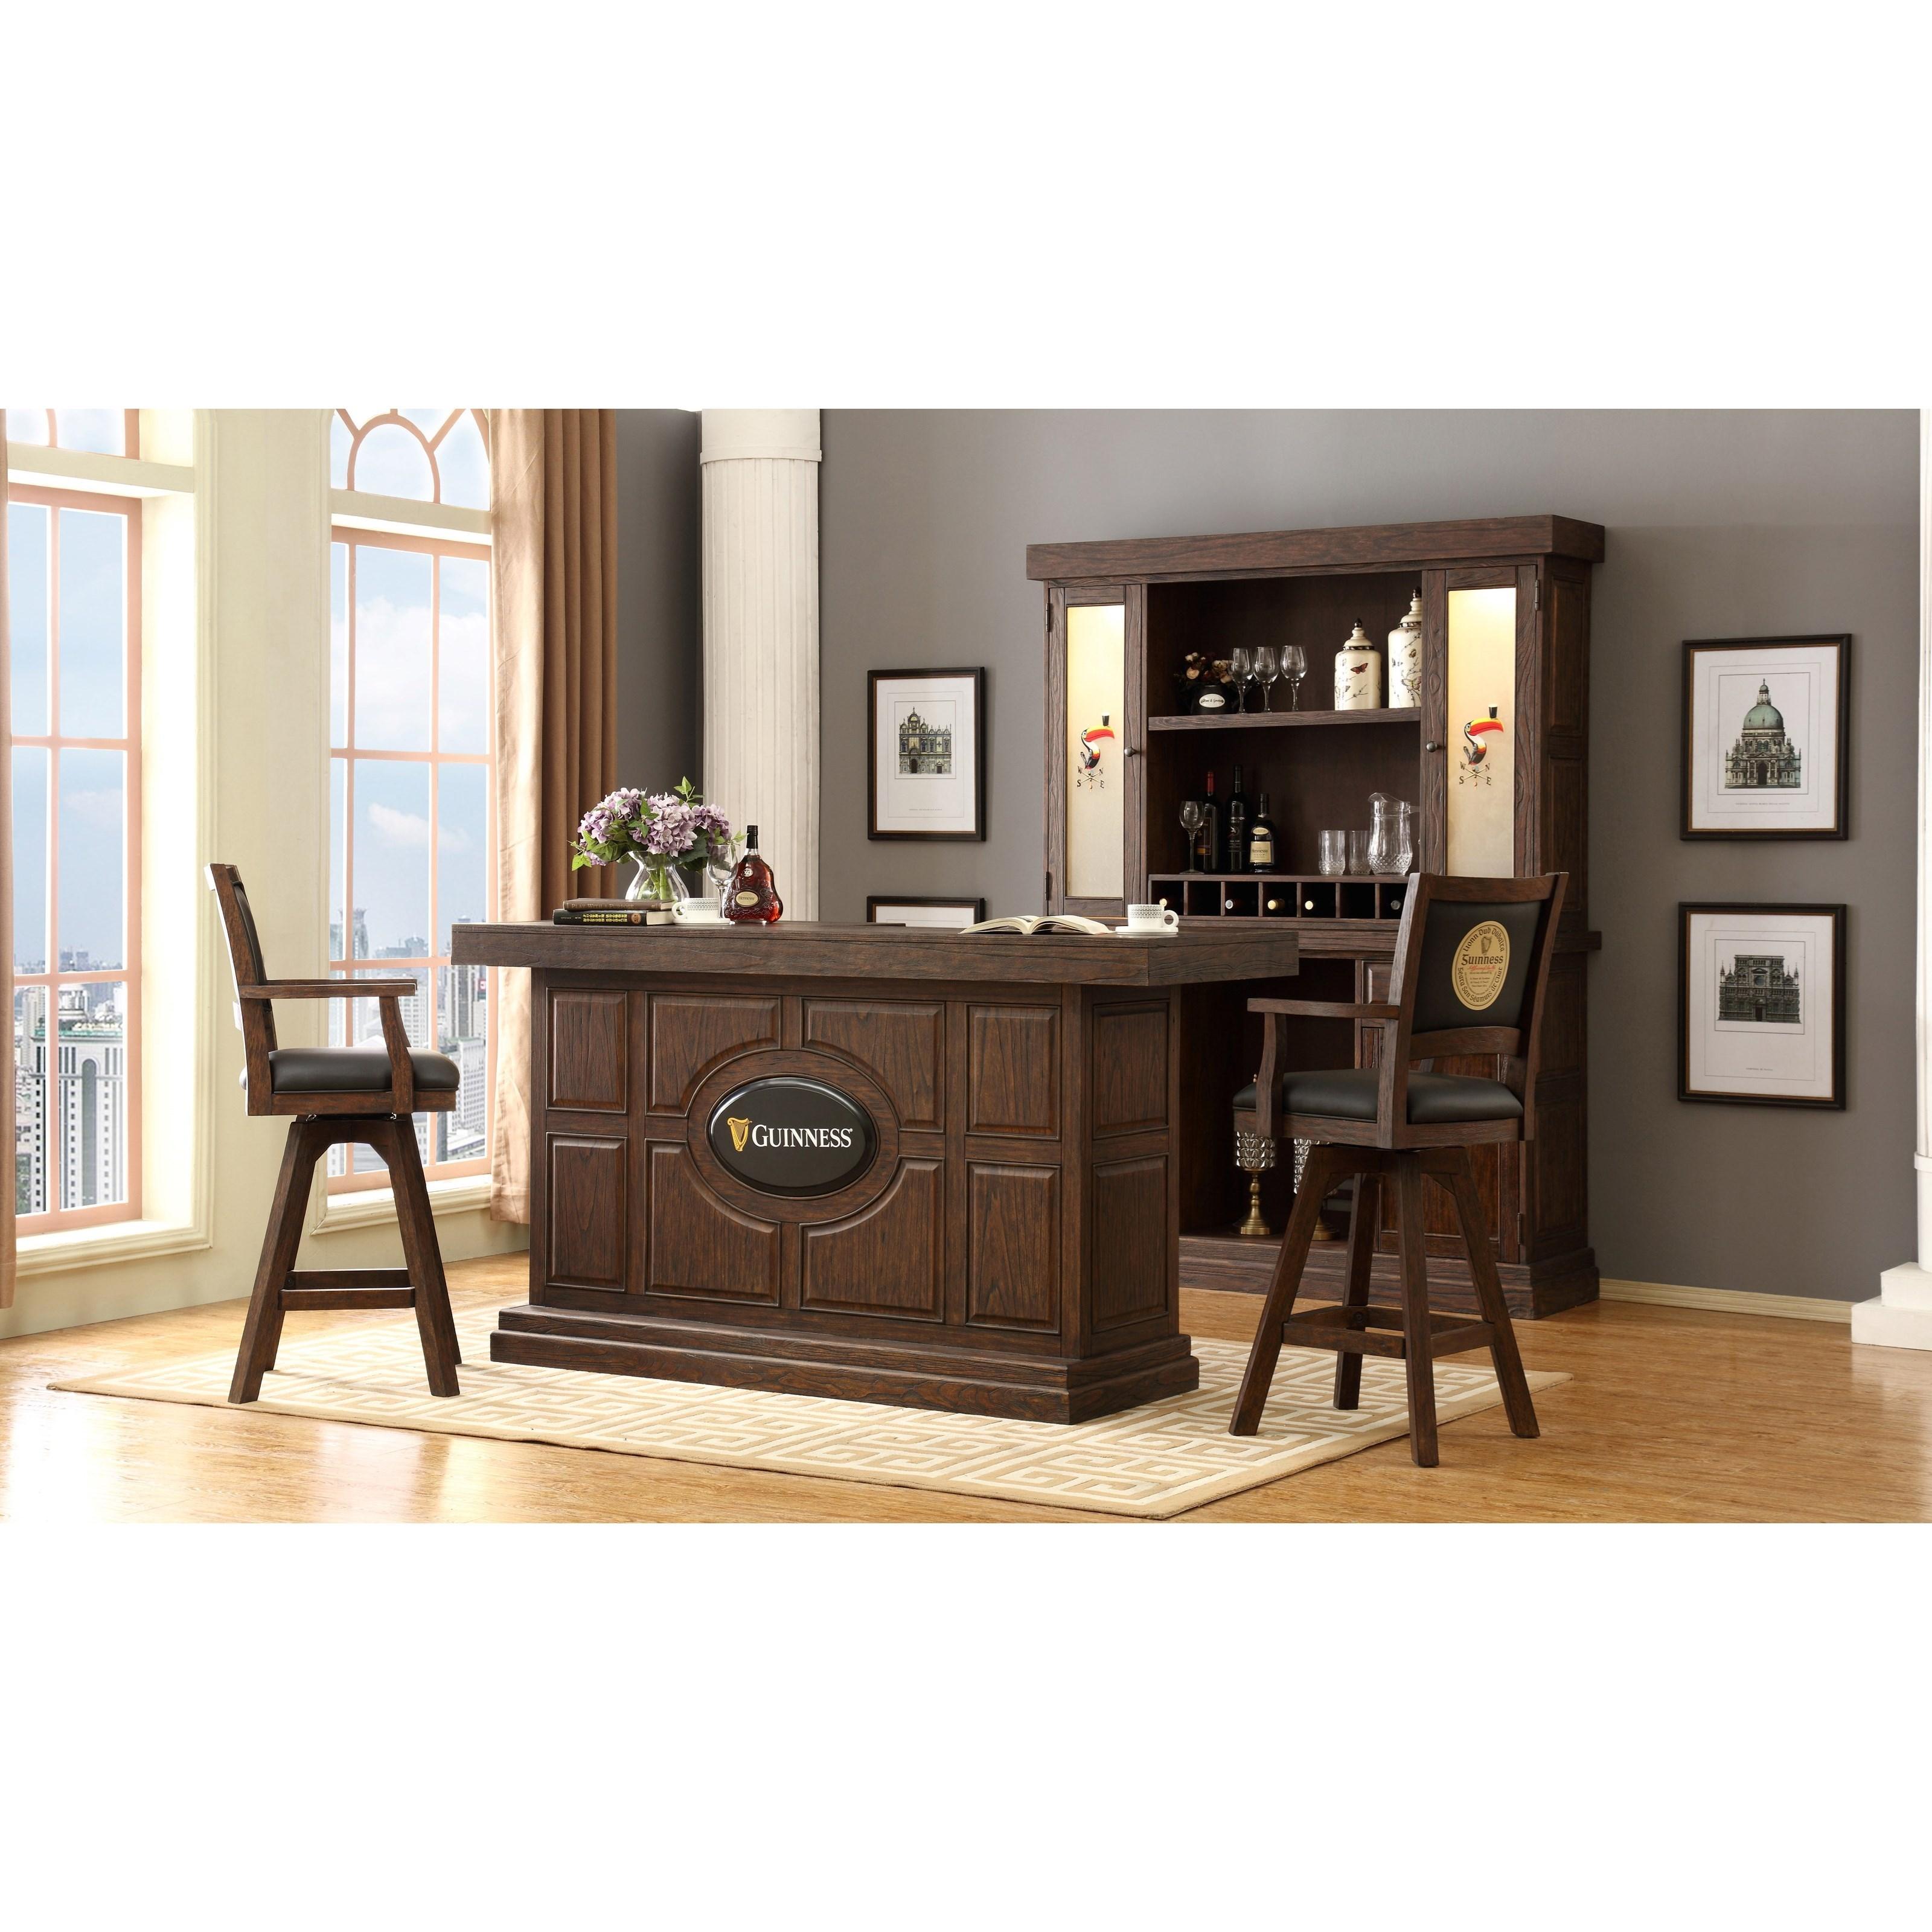 Beau E.C.I. Furniture Guinness BarGuinness Bar Set With Stools ...